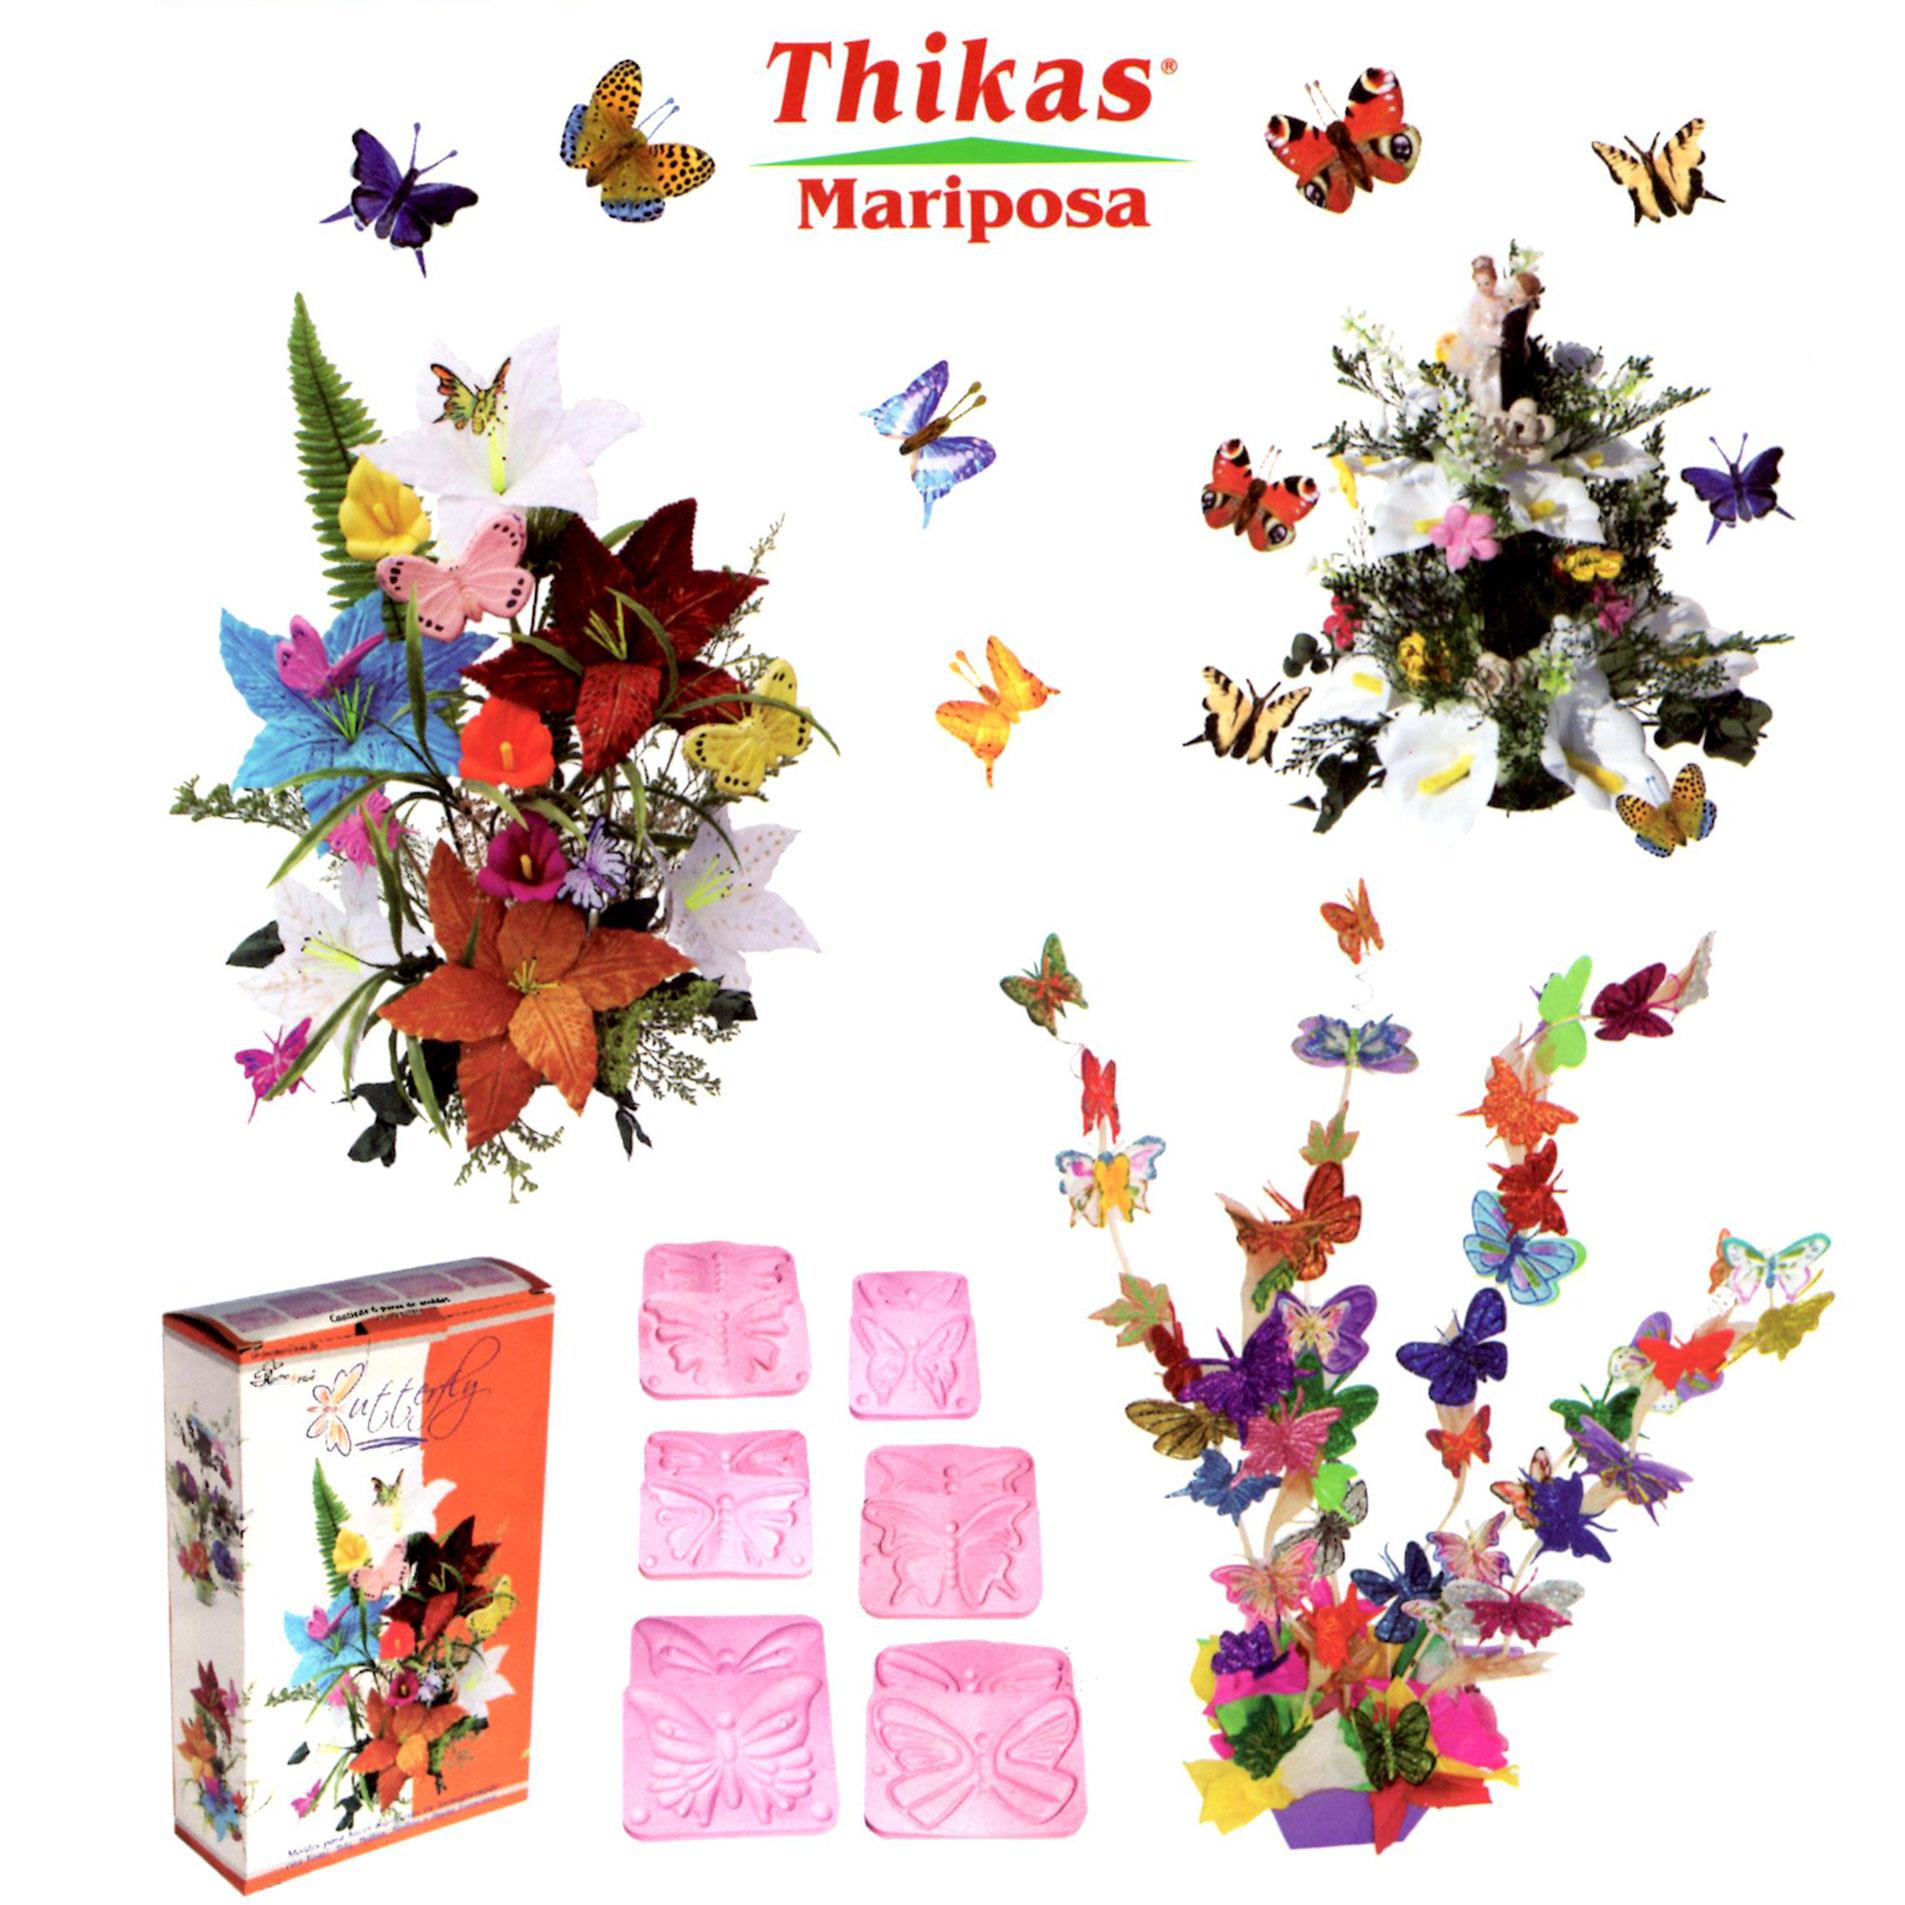 Thikas Mariposas. 4 pares de moldes para termoformado